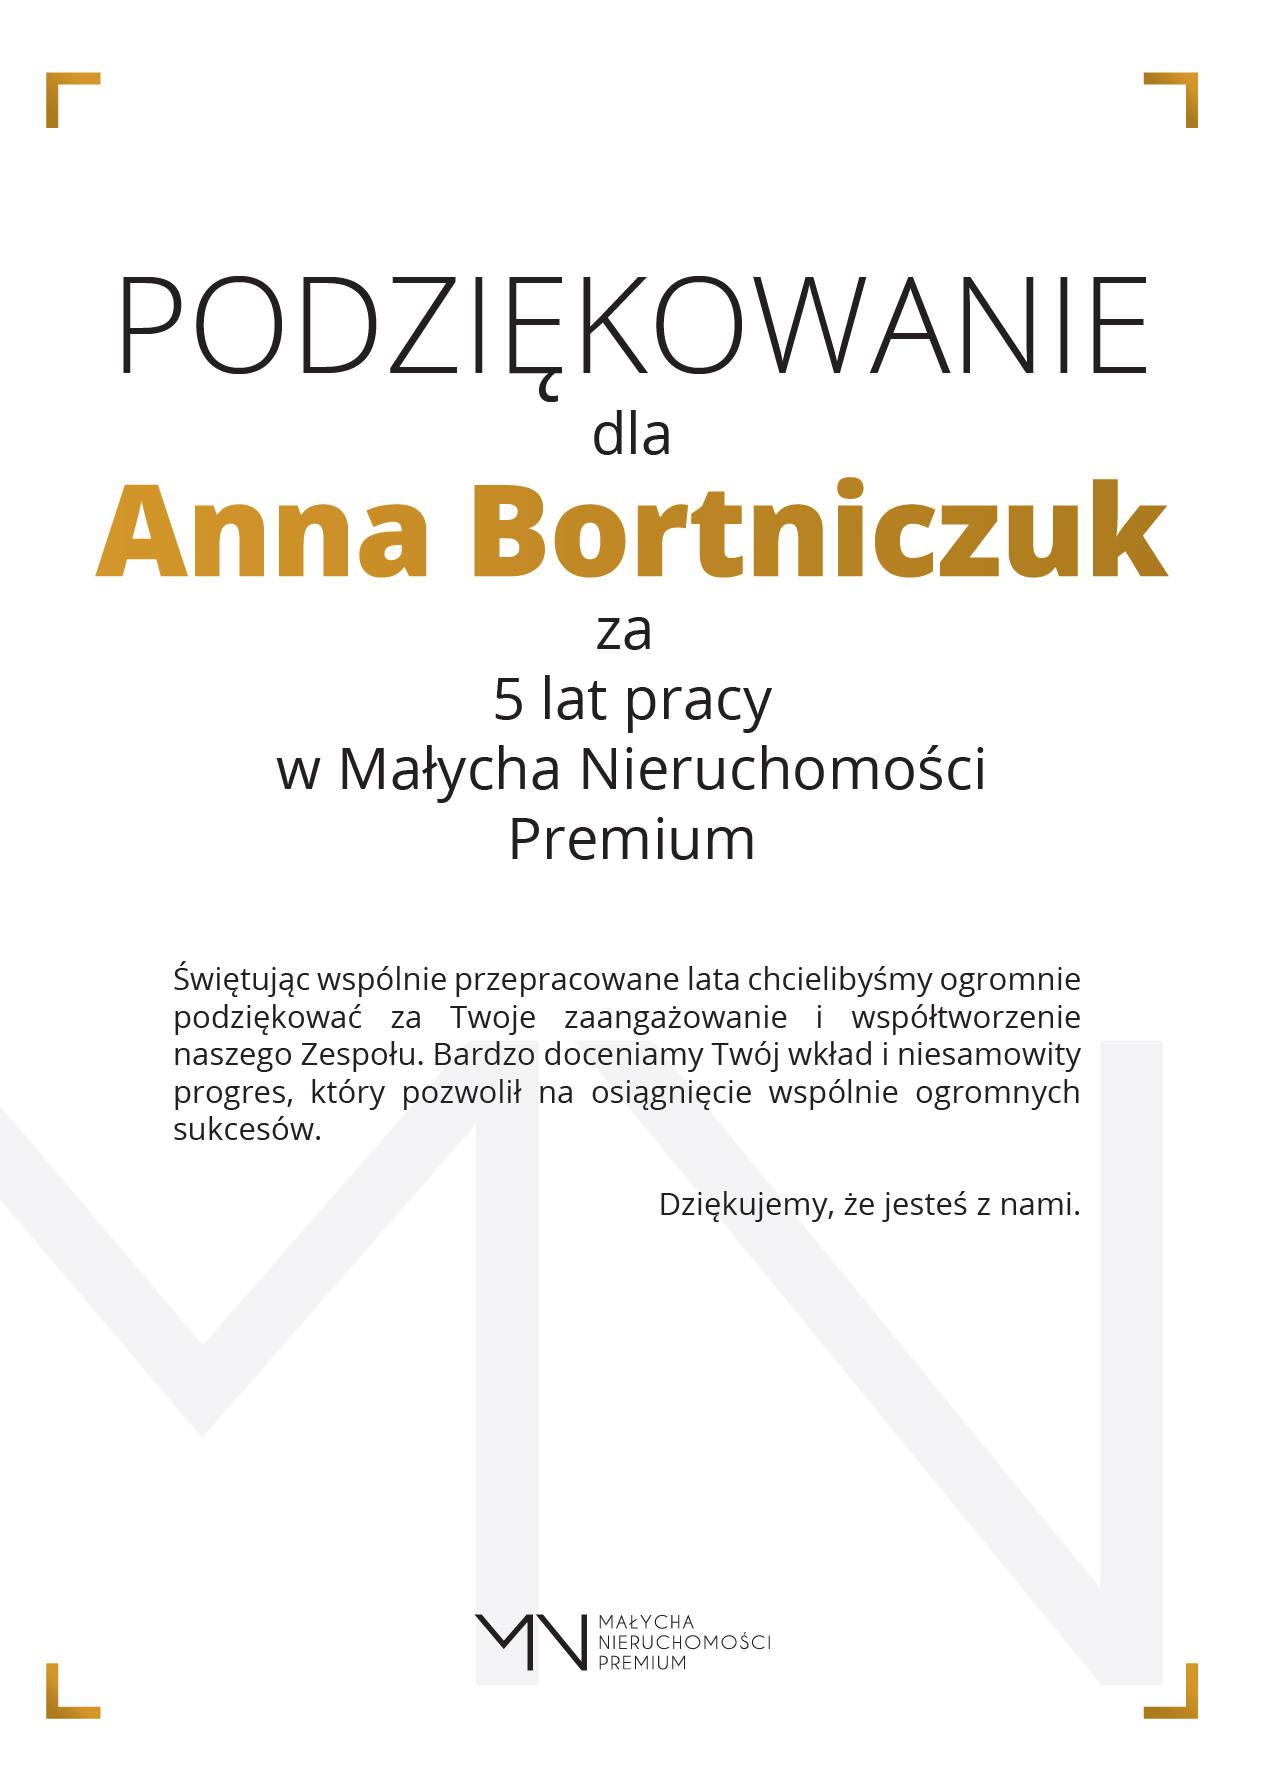 2. Bortniczuk-01